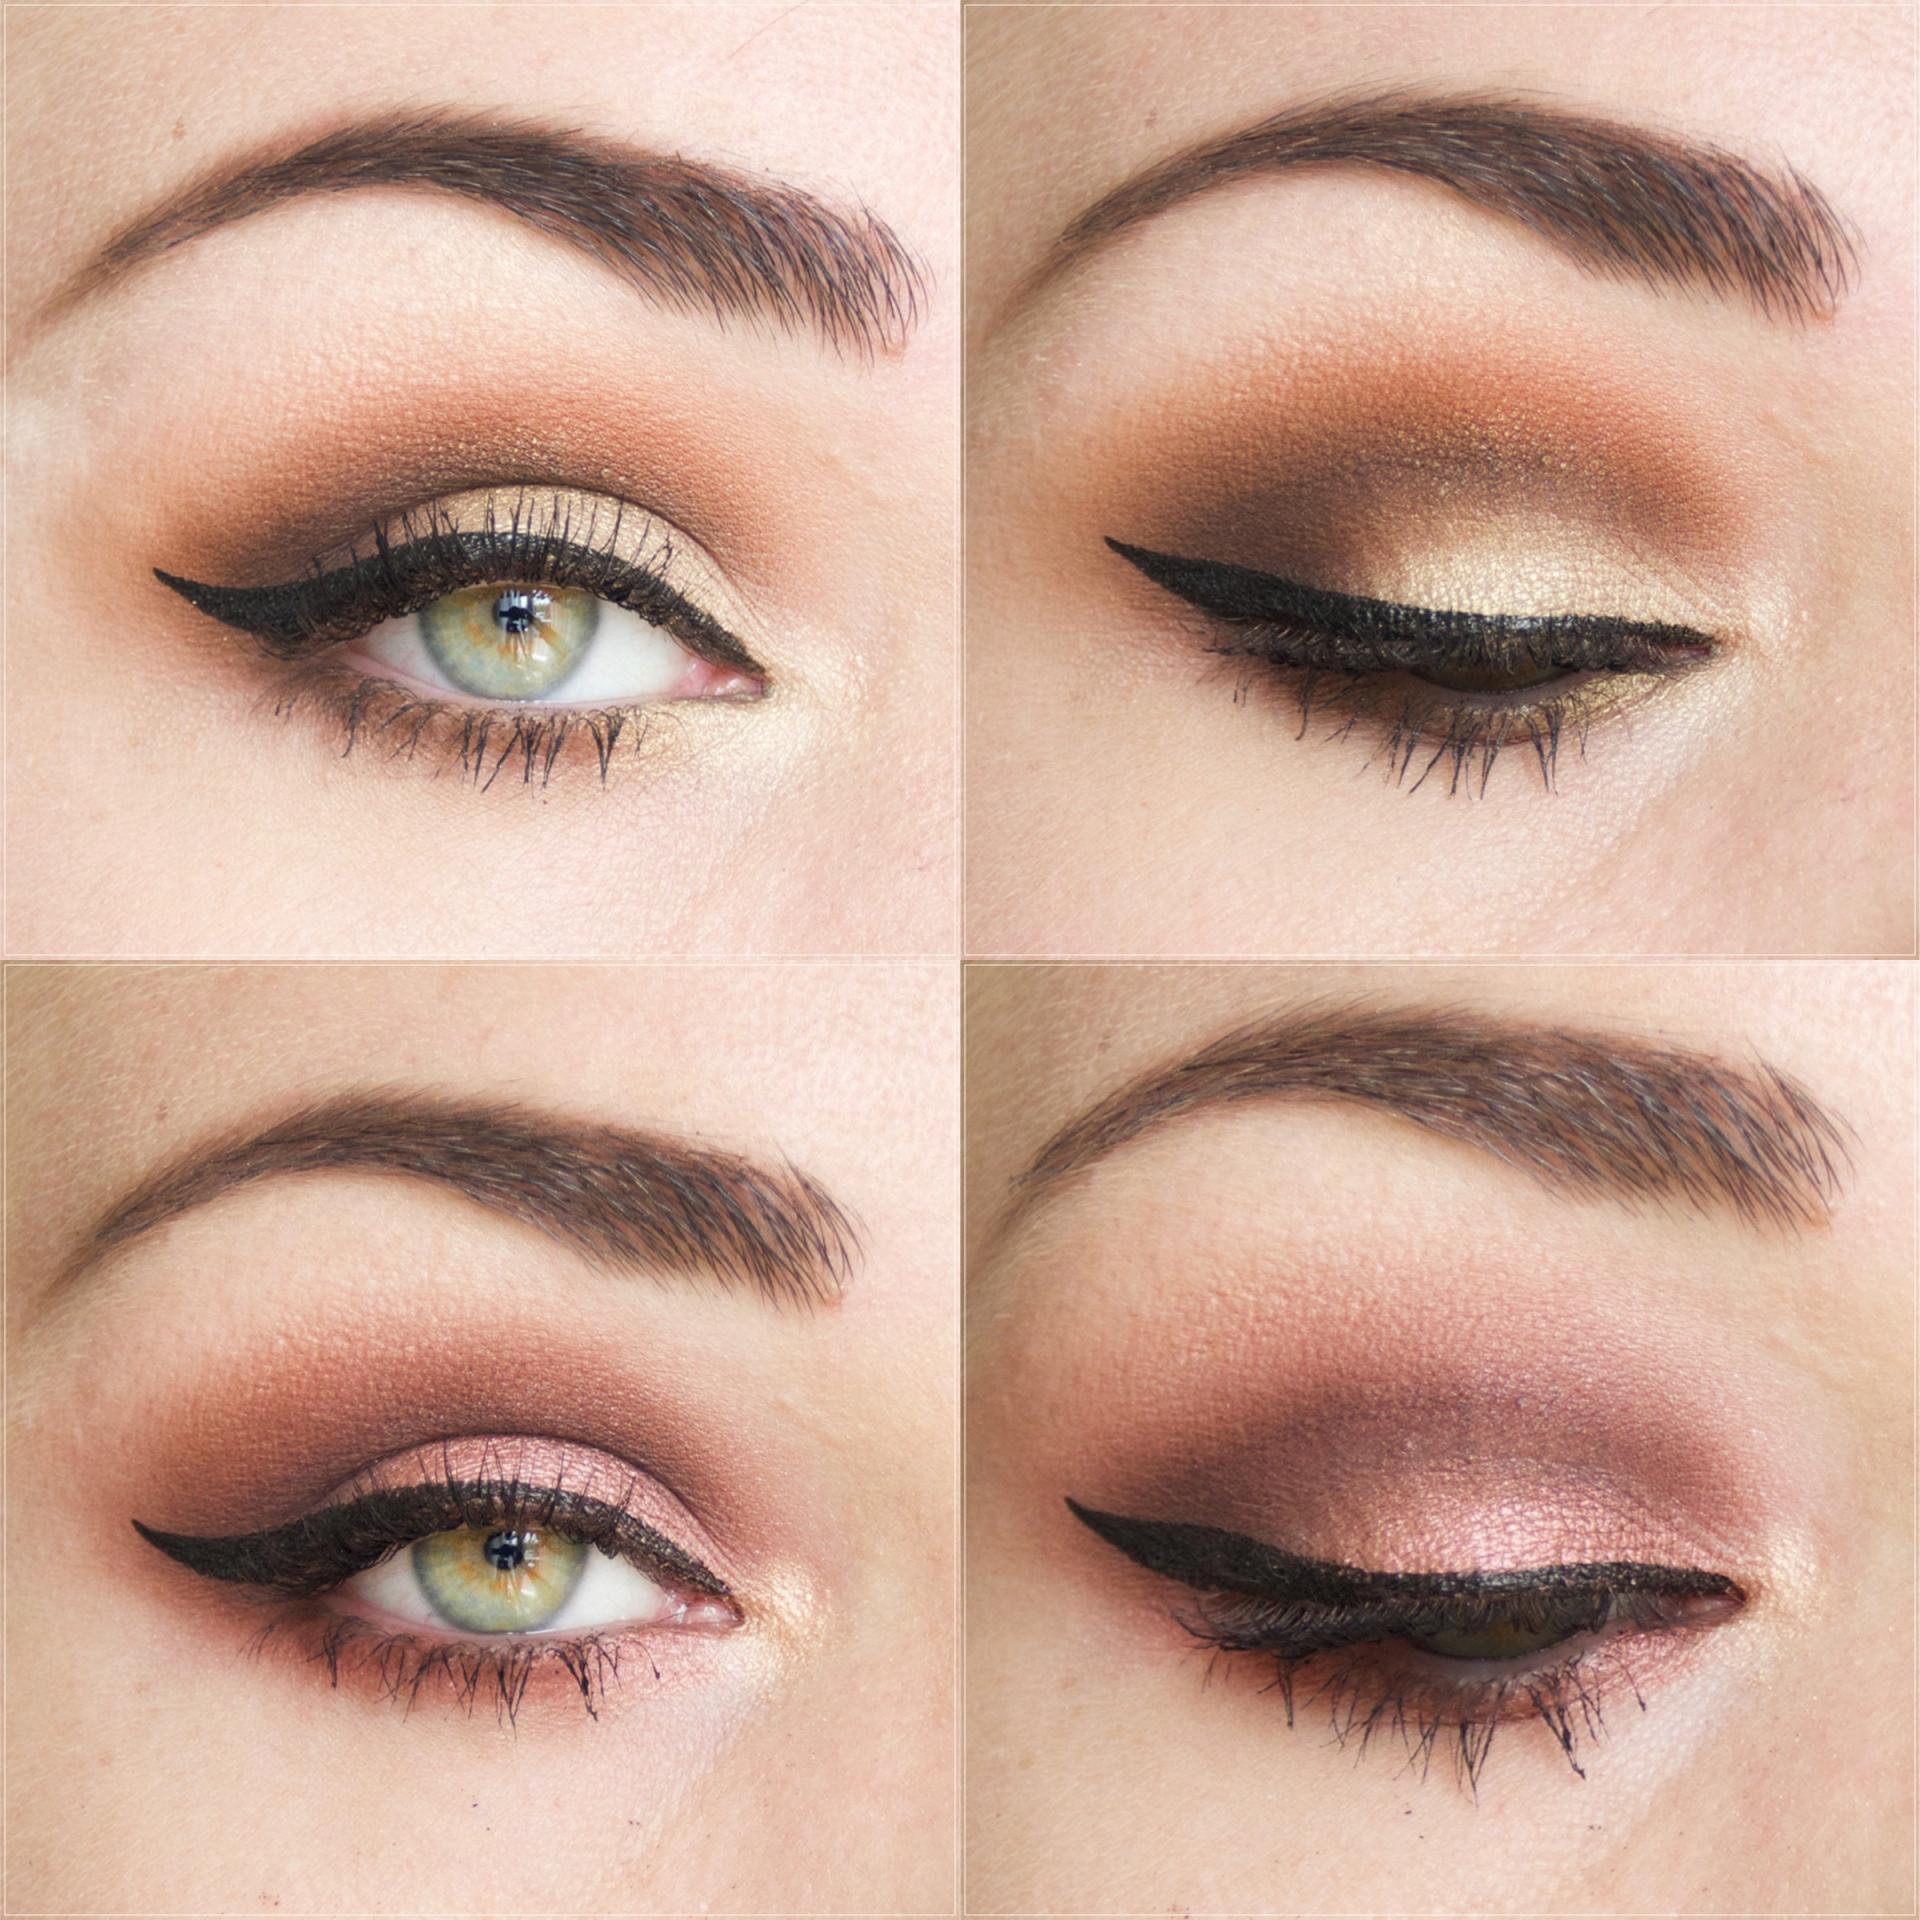 Anastasia Soft Glam palette